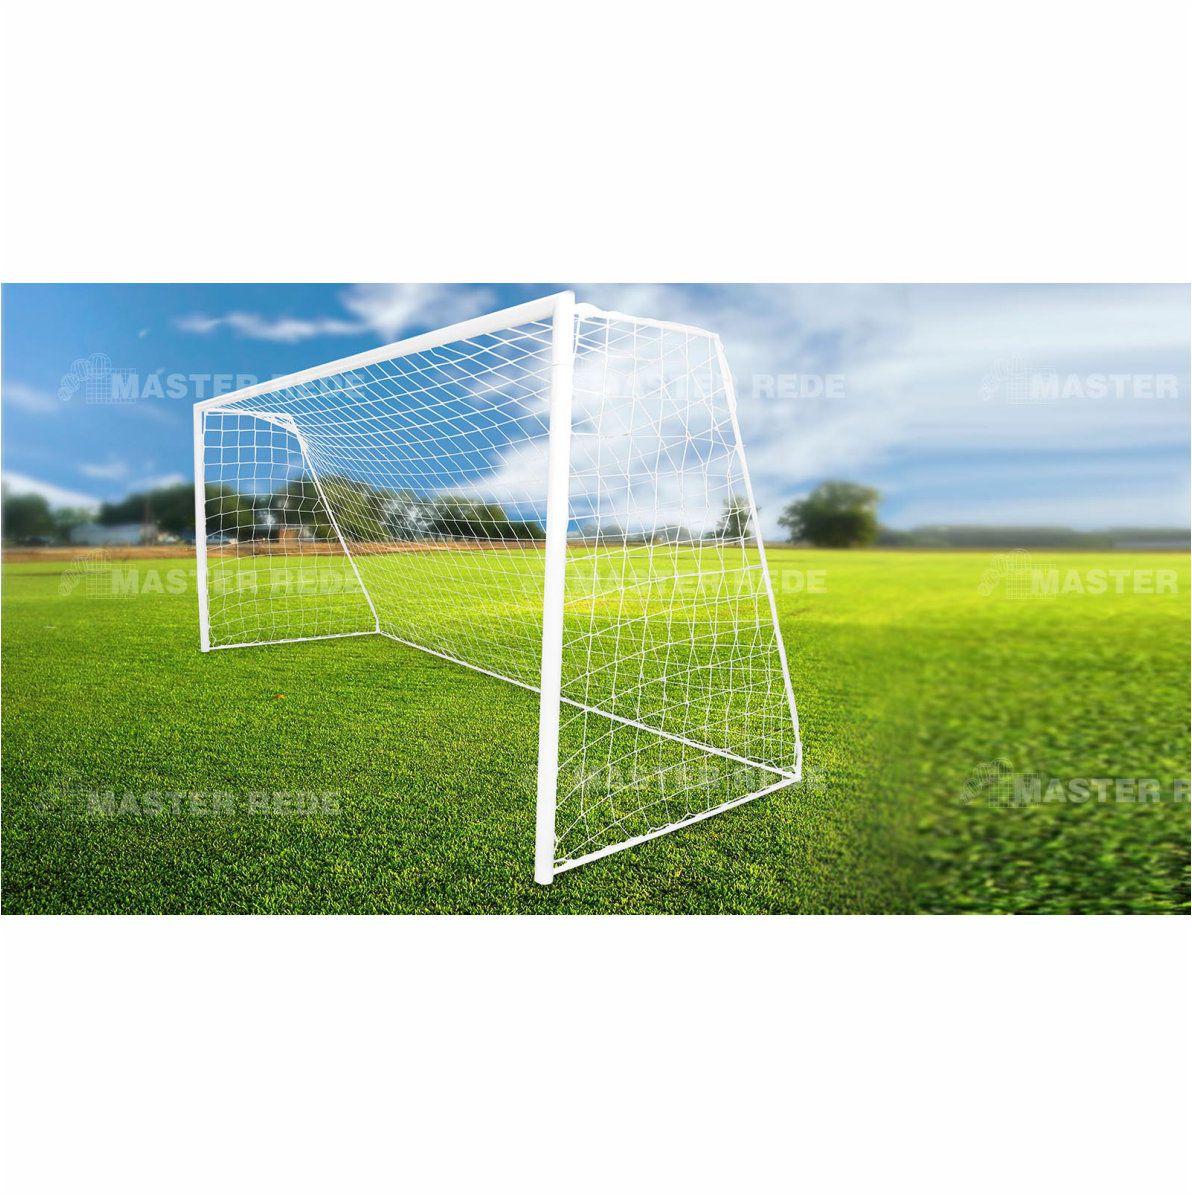 Rede Futebol Suiço Society Master Rede de 5M Fio 3MM Seda F5-L3